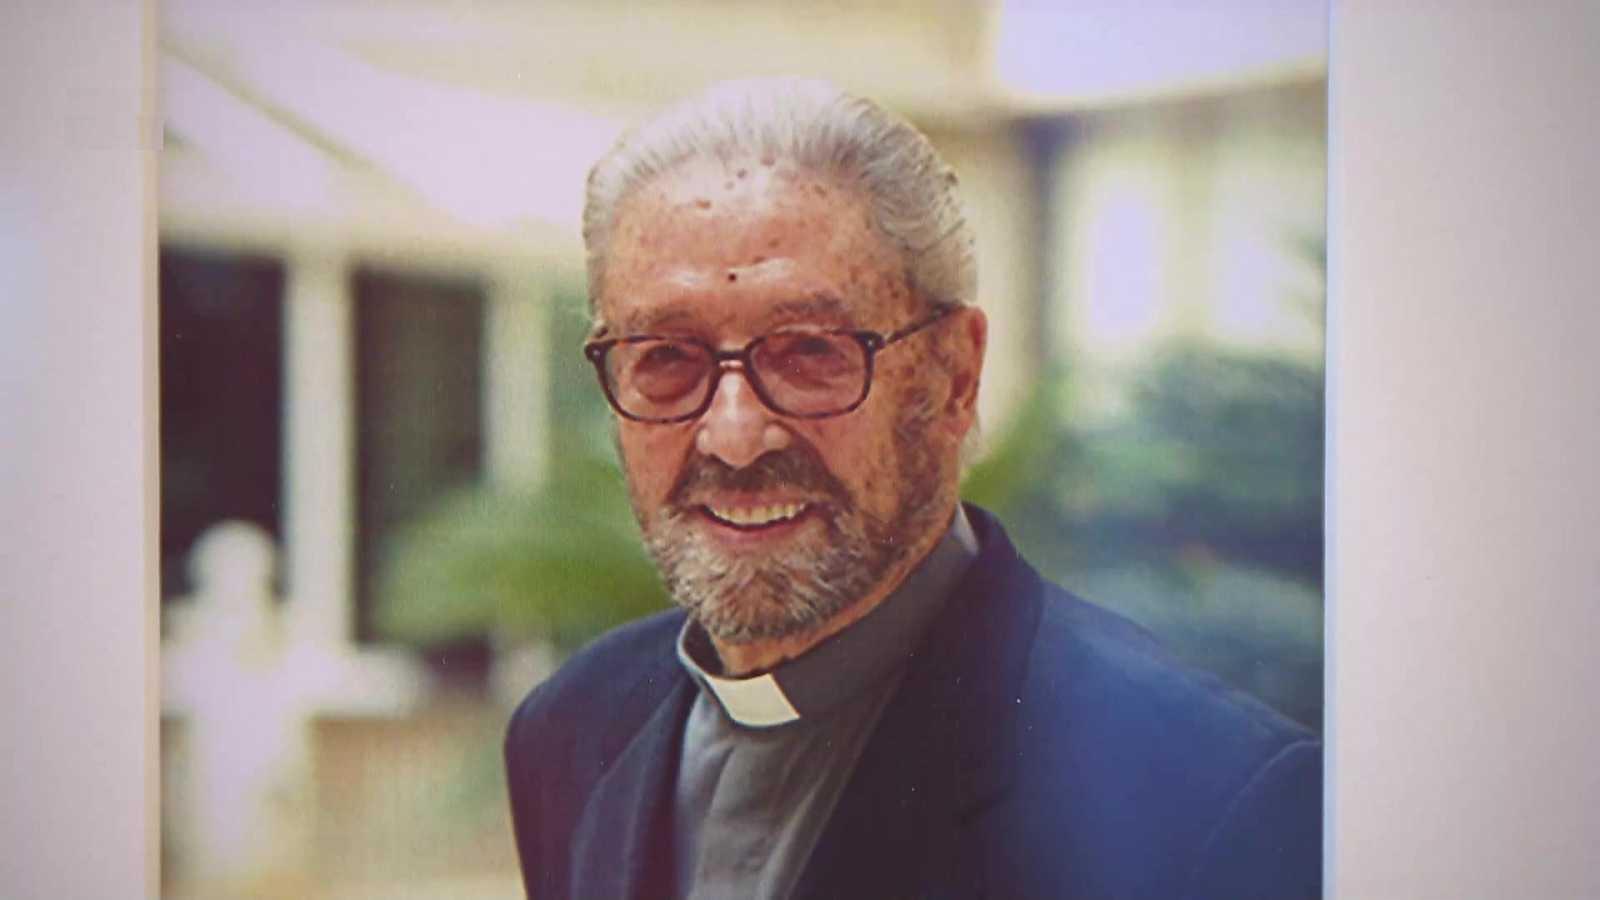 Testimonio - Padre Garralda, Horizontes Abiertos - ver ahora